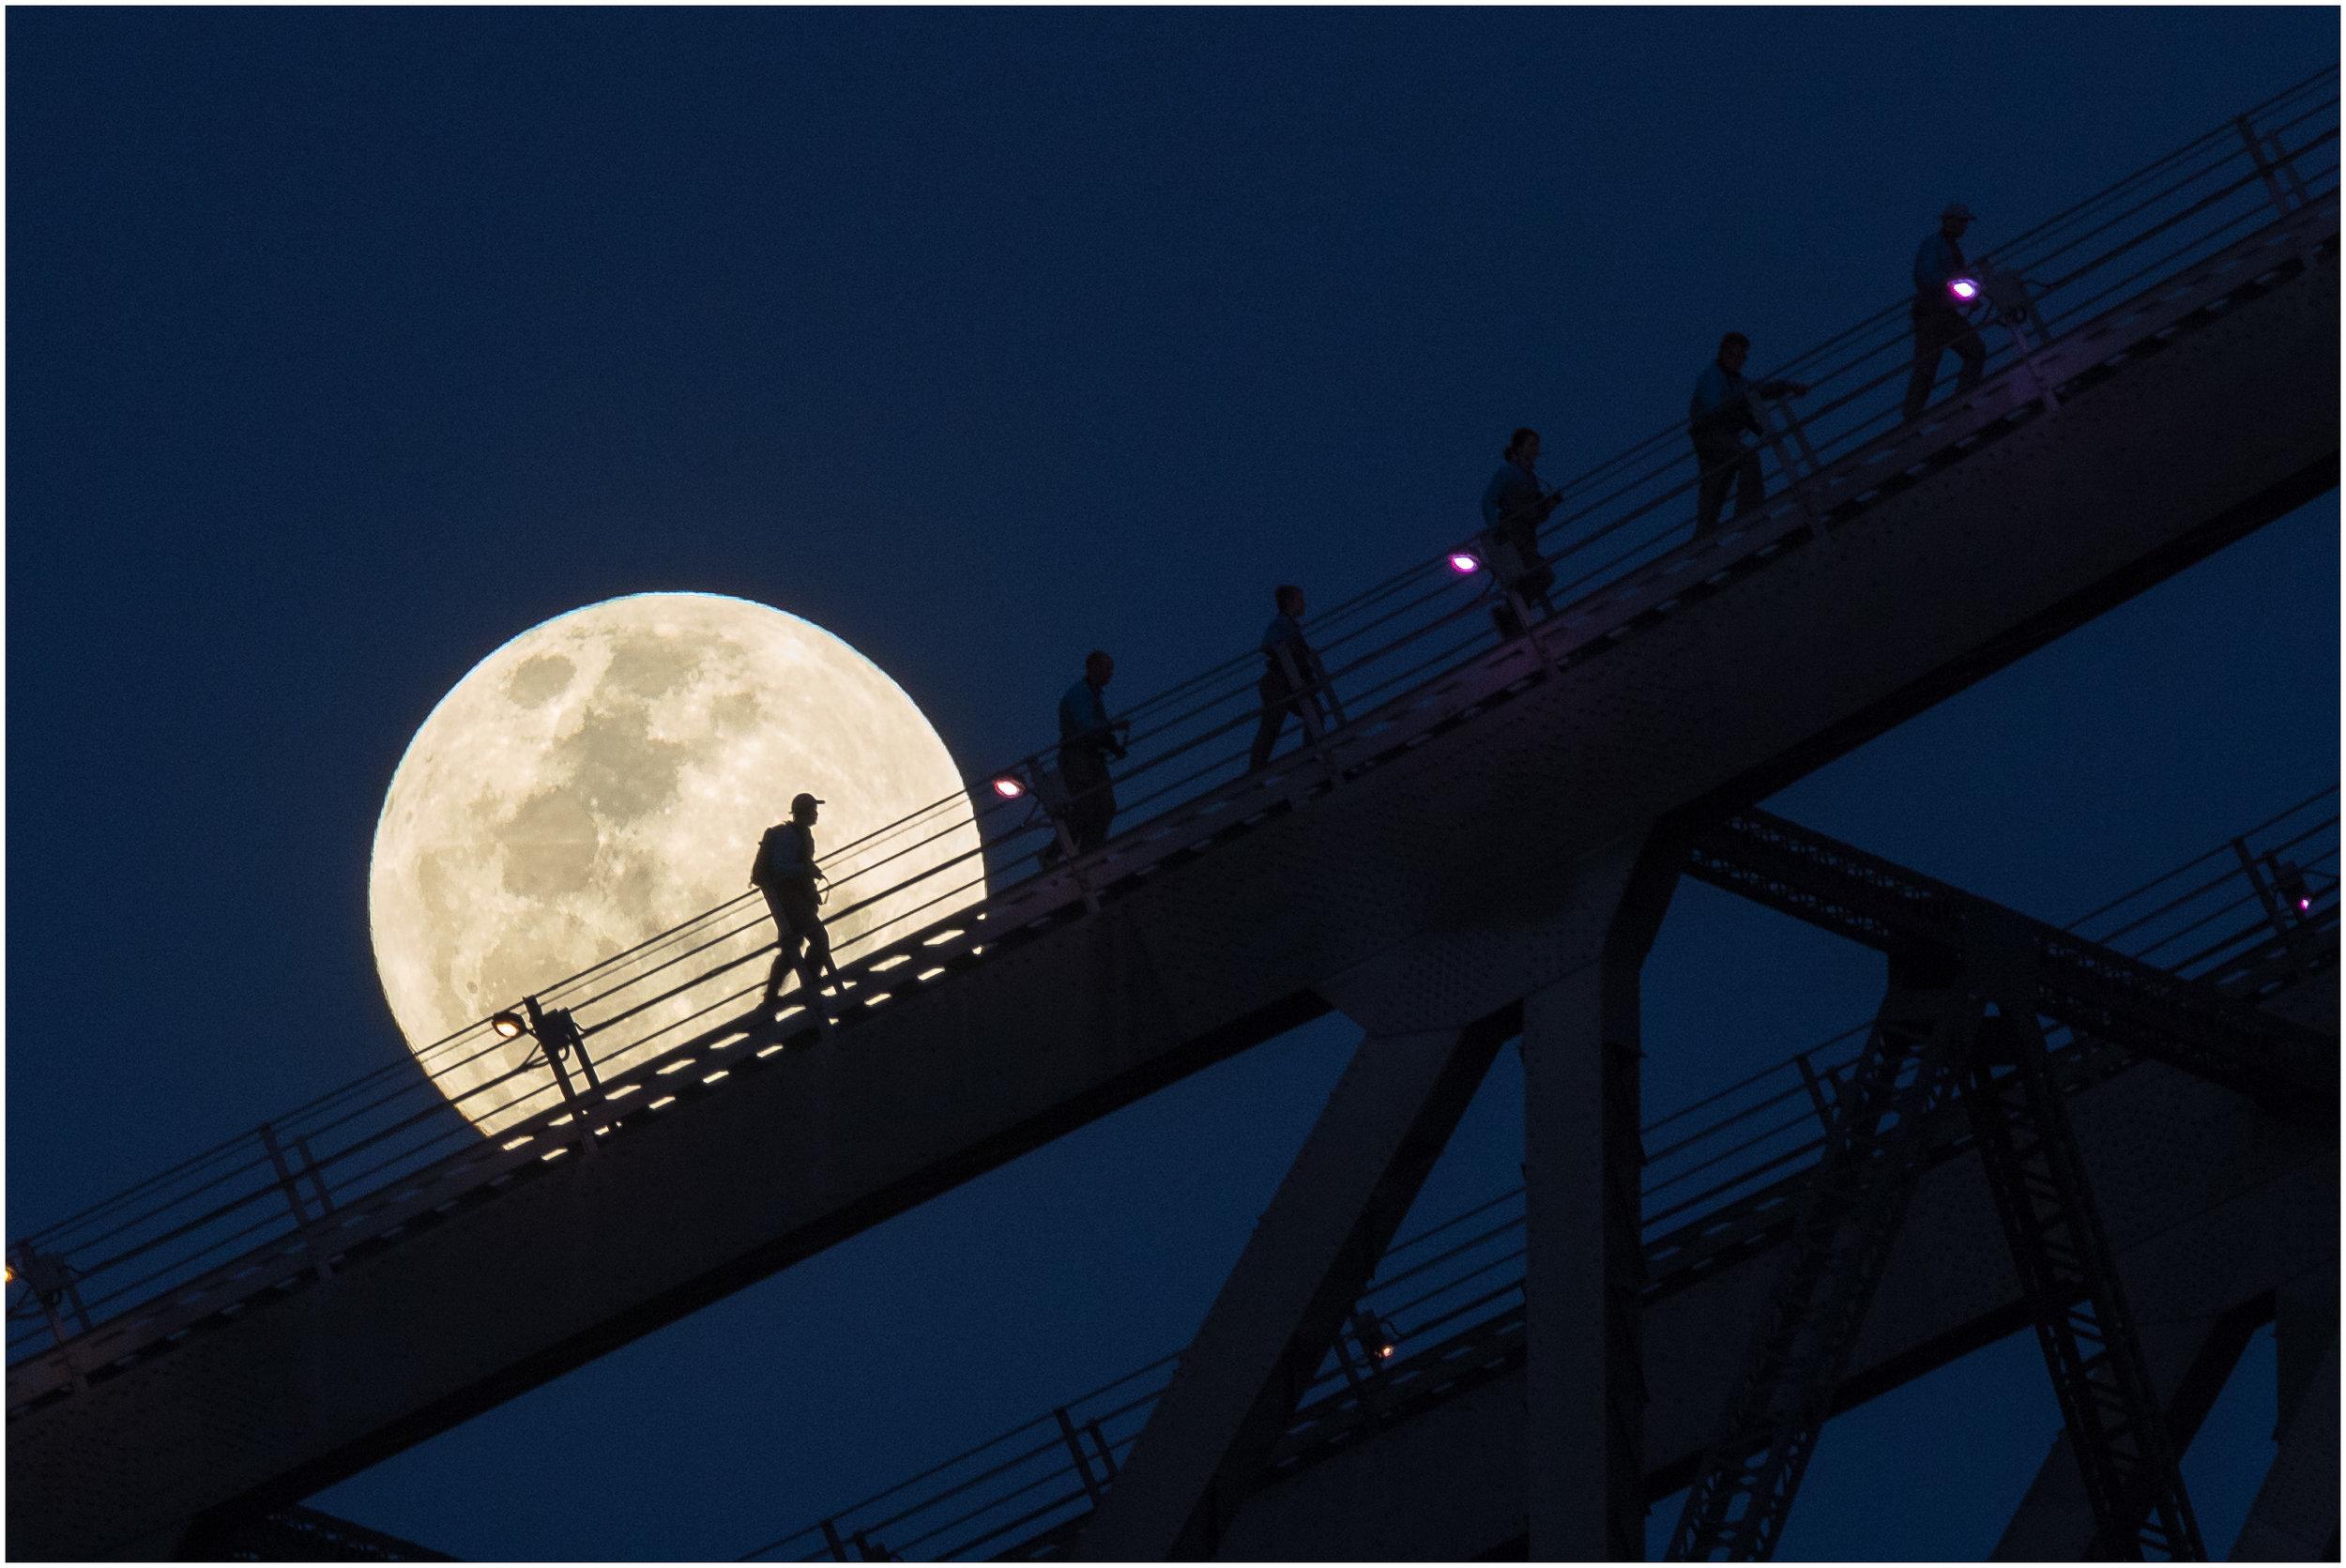 DPI_1st_Pictorial_Moonwalk_ElizabethRiley_BGr